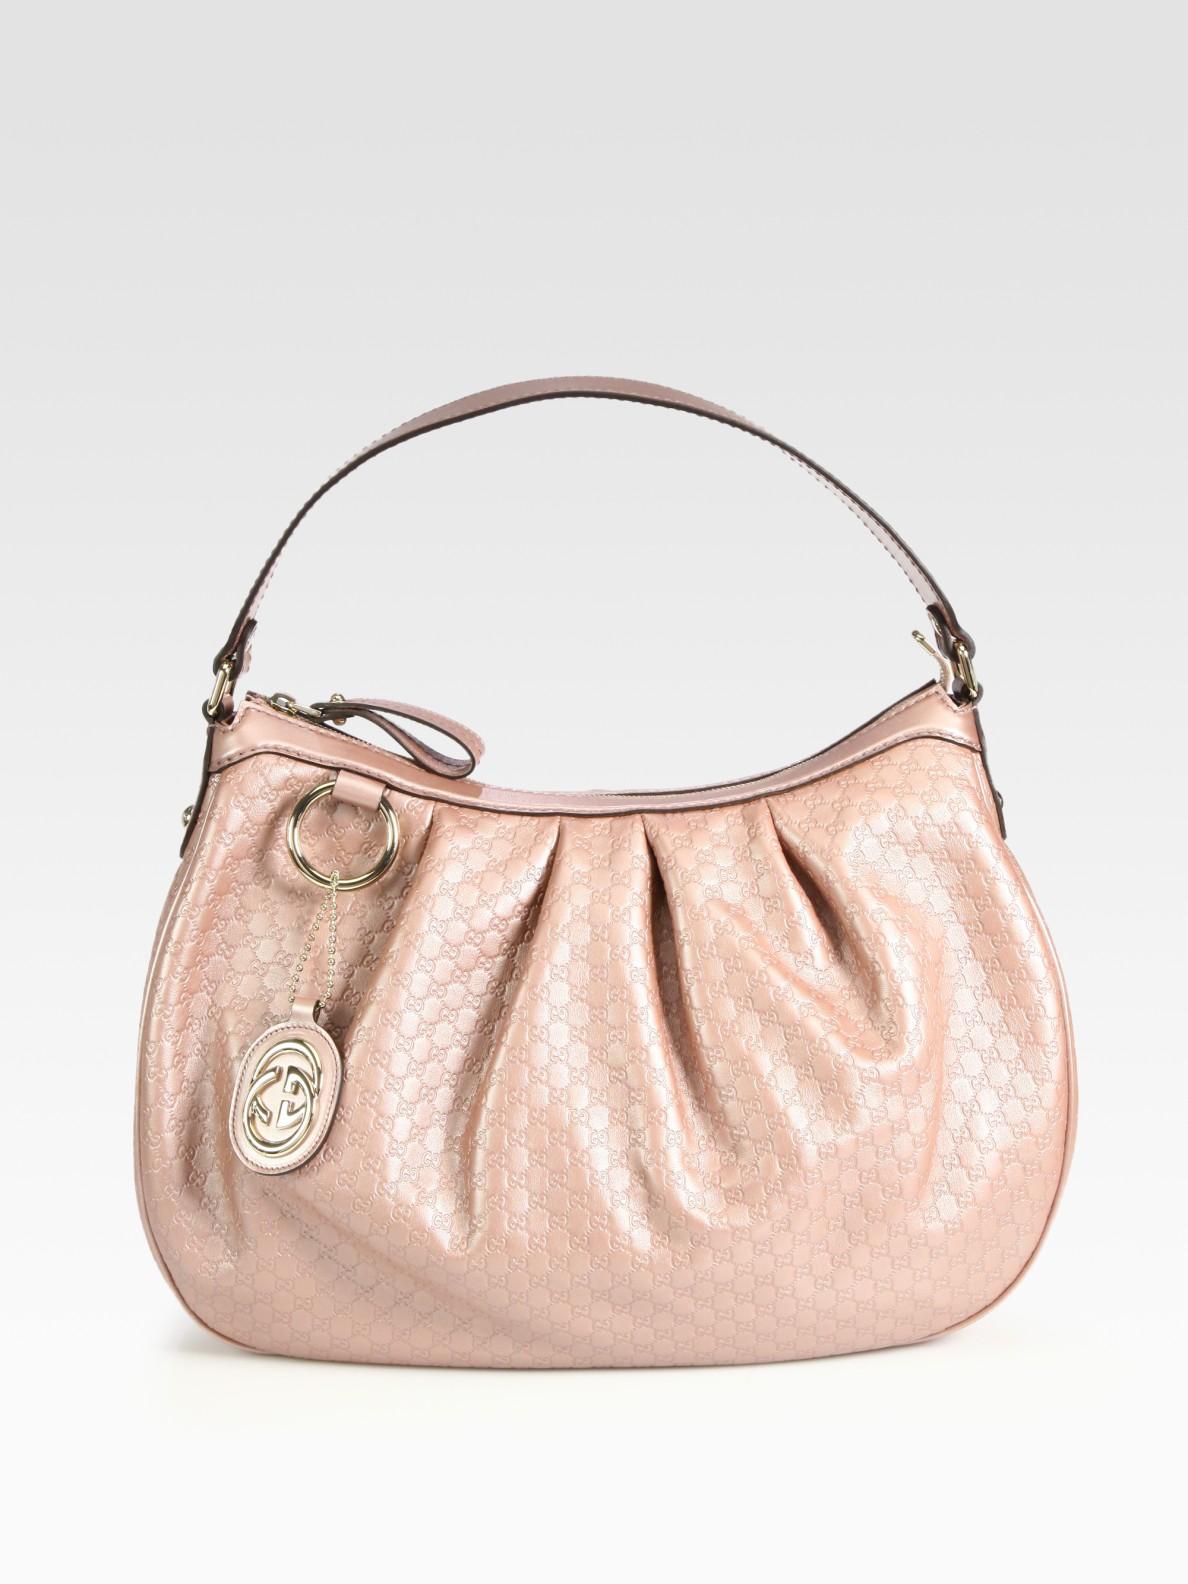 01c30ccce0a Lyst - Gucci Sukey Medium Metallic Microguccissima Leather Hobo in ...